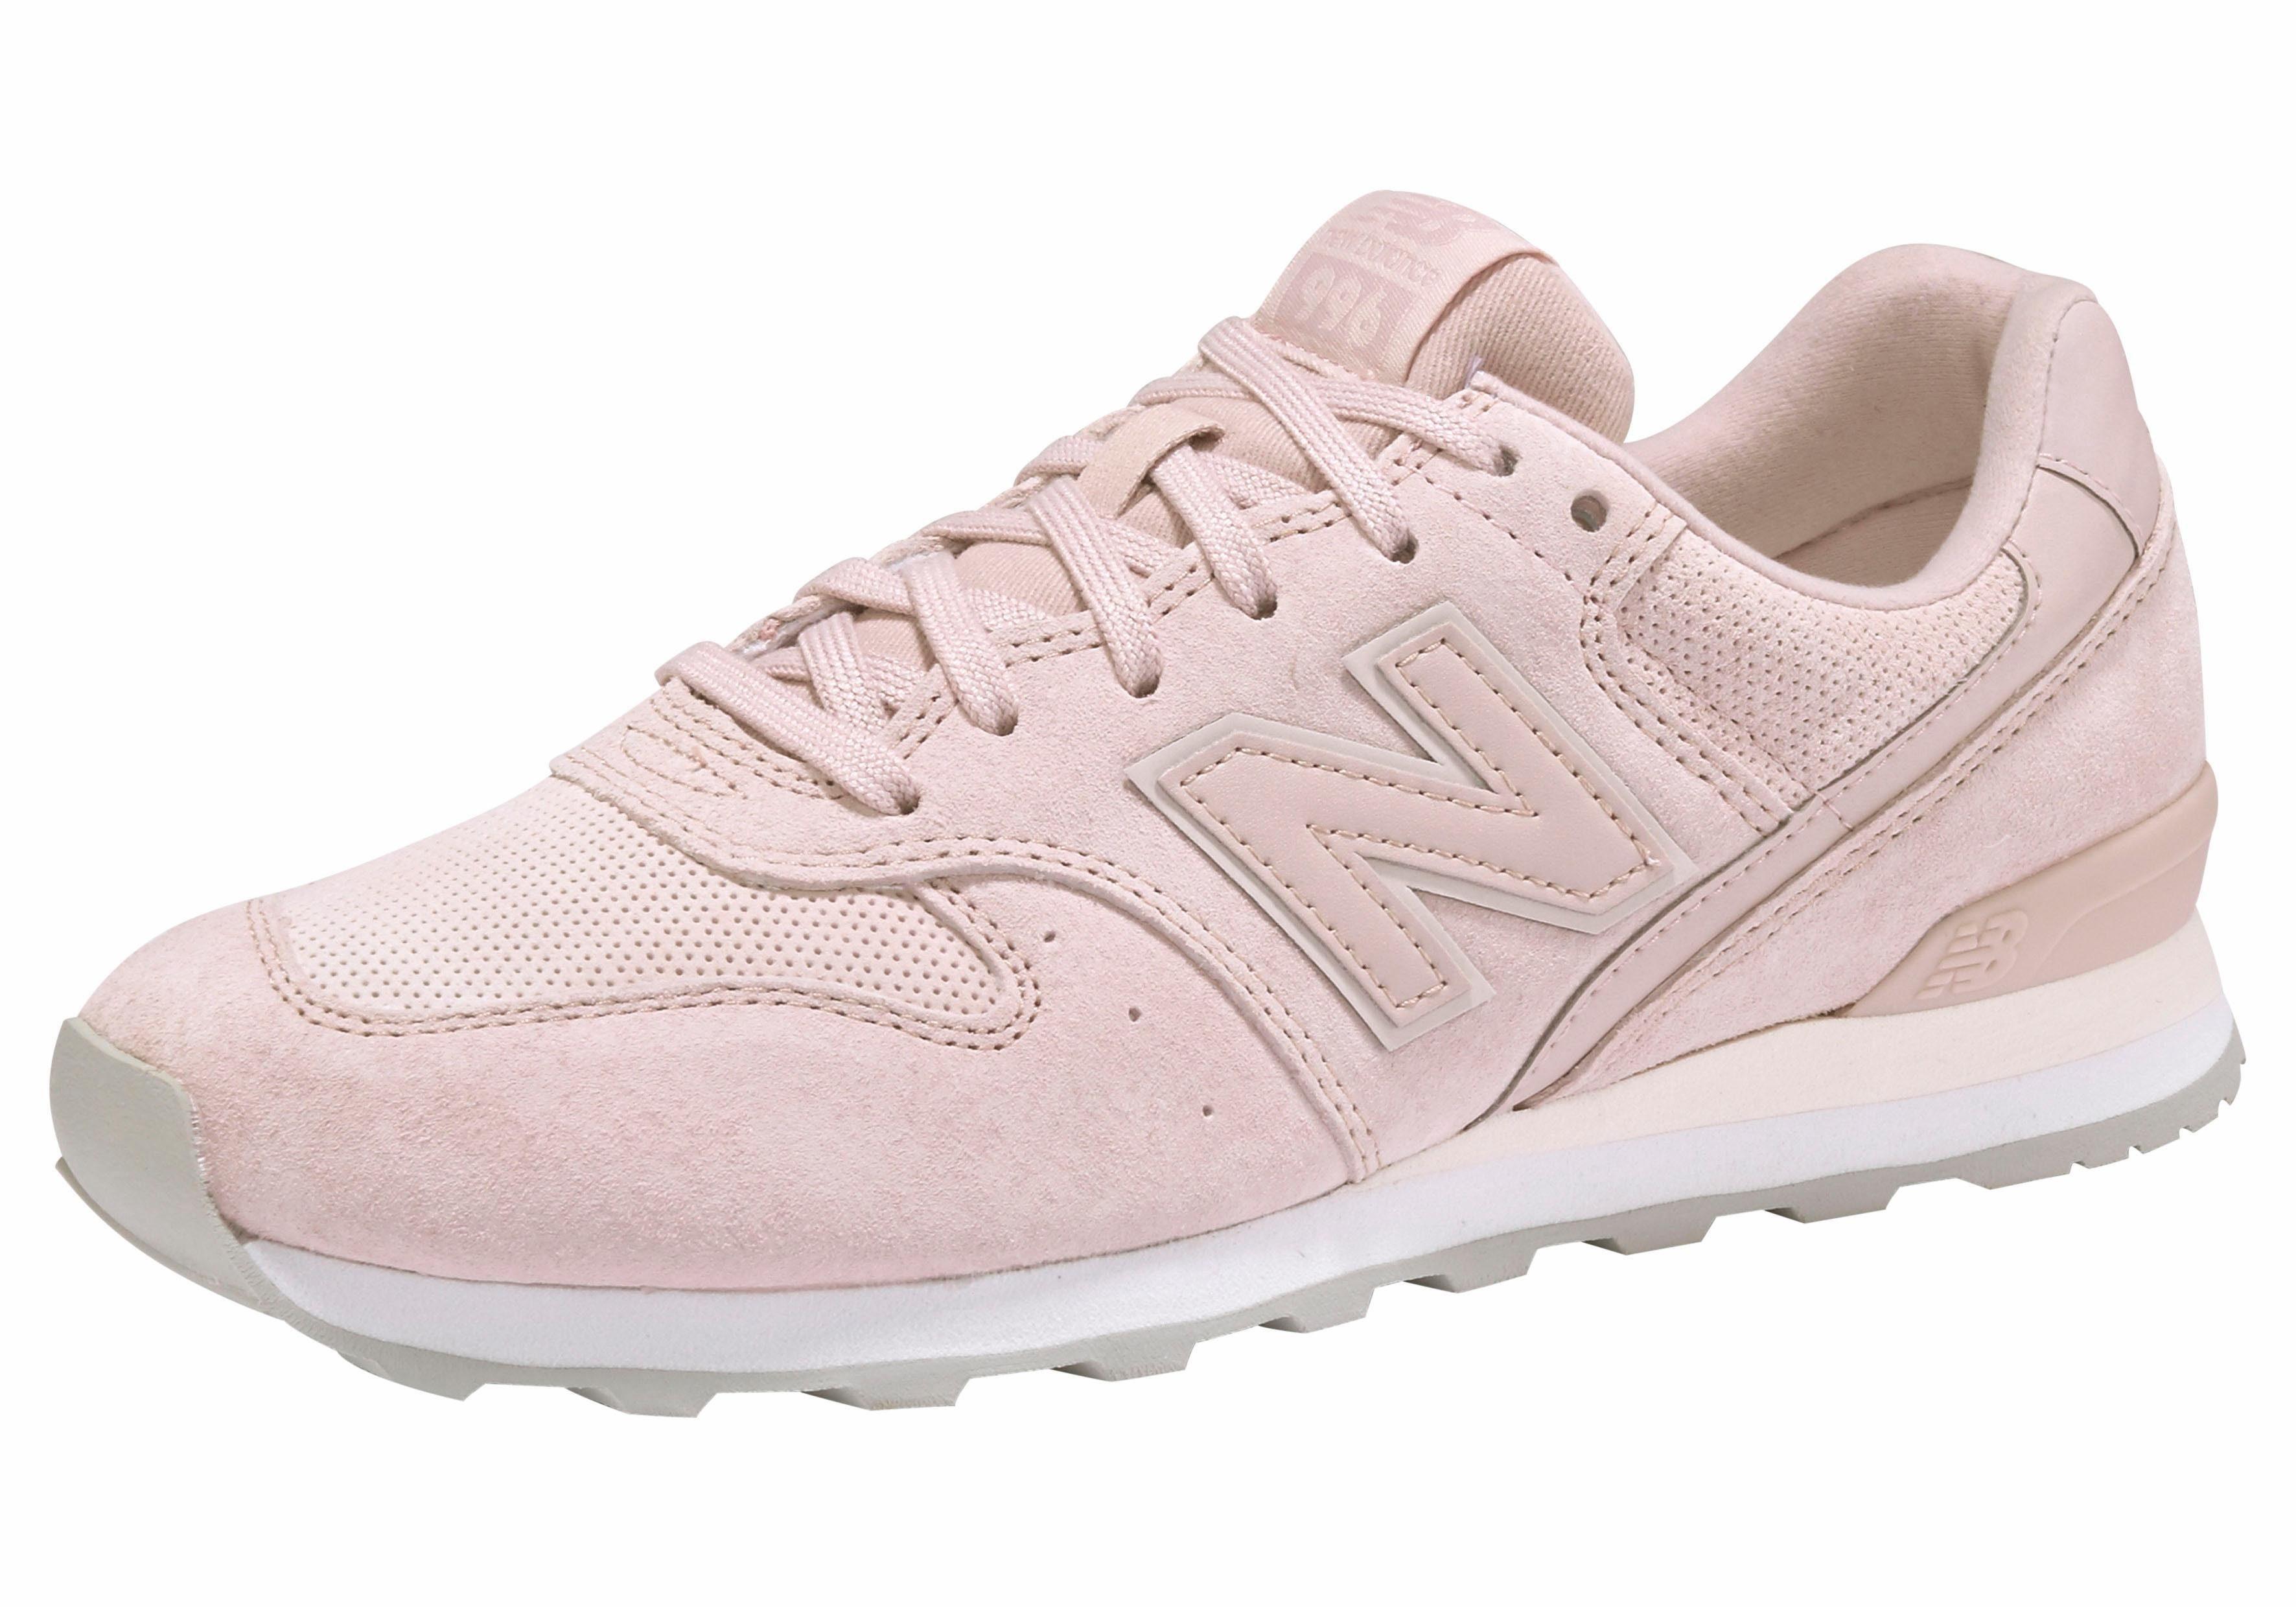 New Balance WR 996 Sneaker online kaufen  rosa